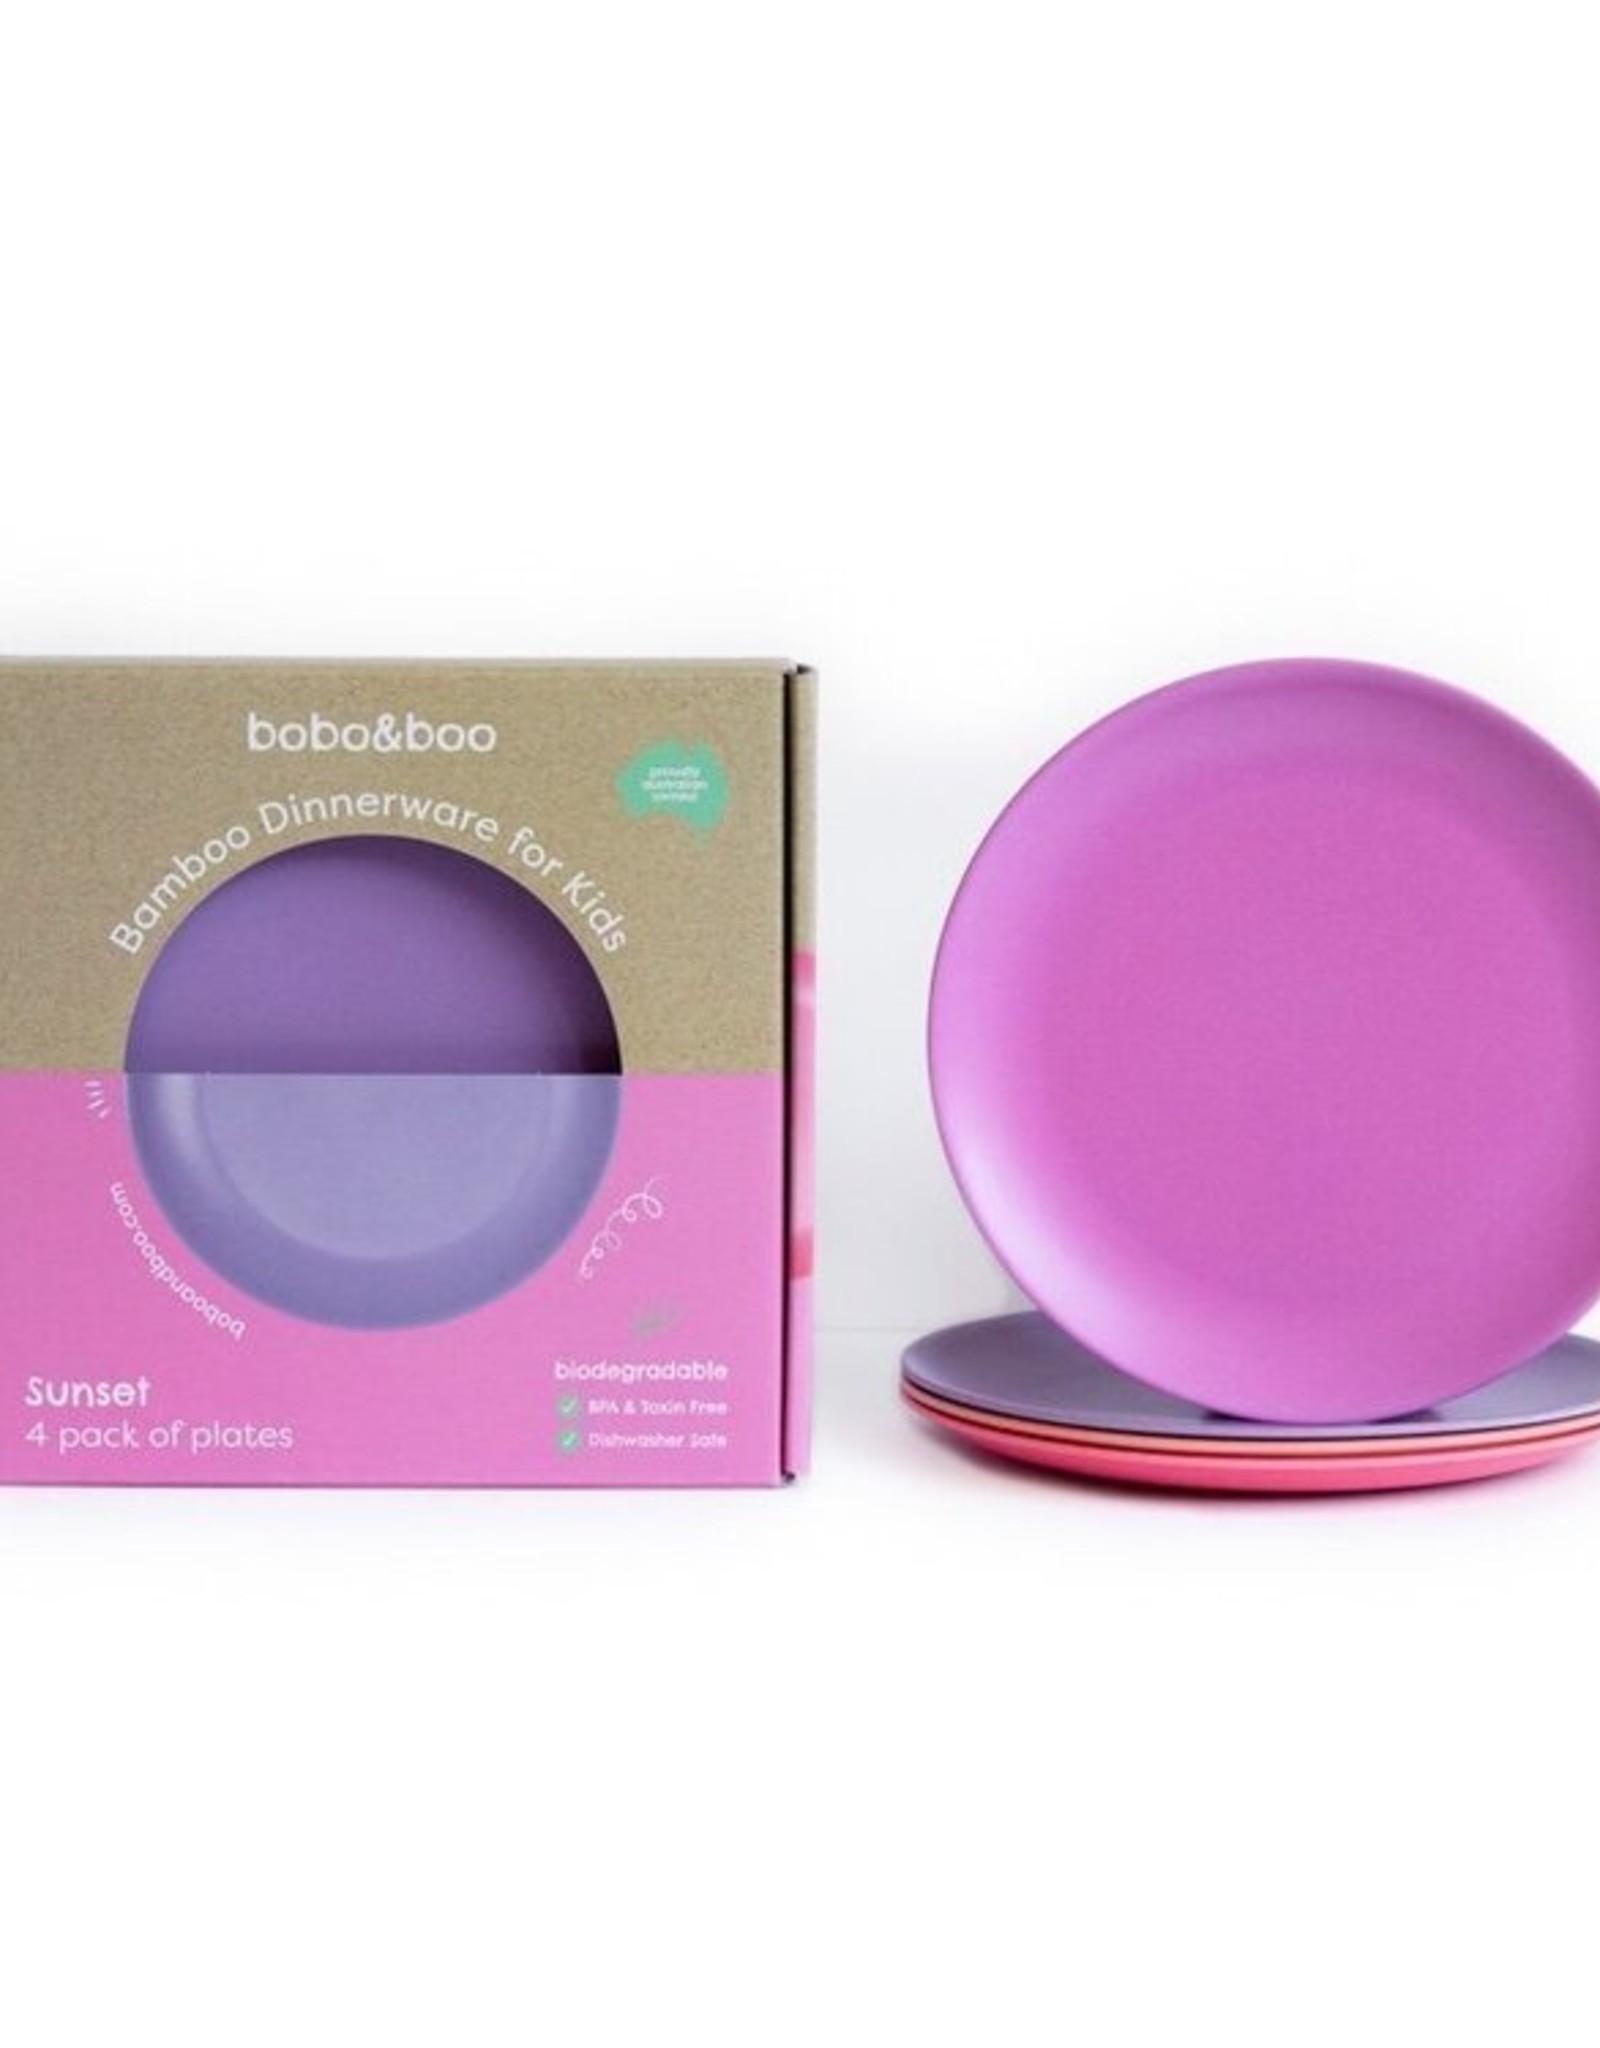 bobo & boo Bamboe borden set GROOT - Sunset pink